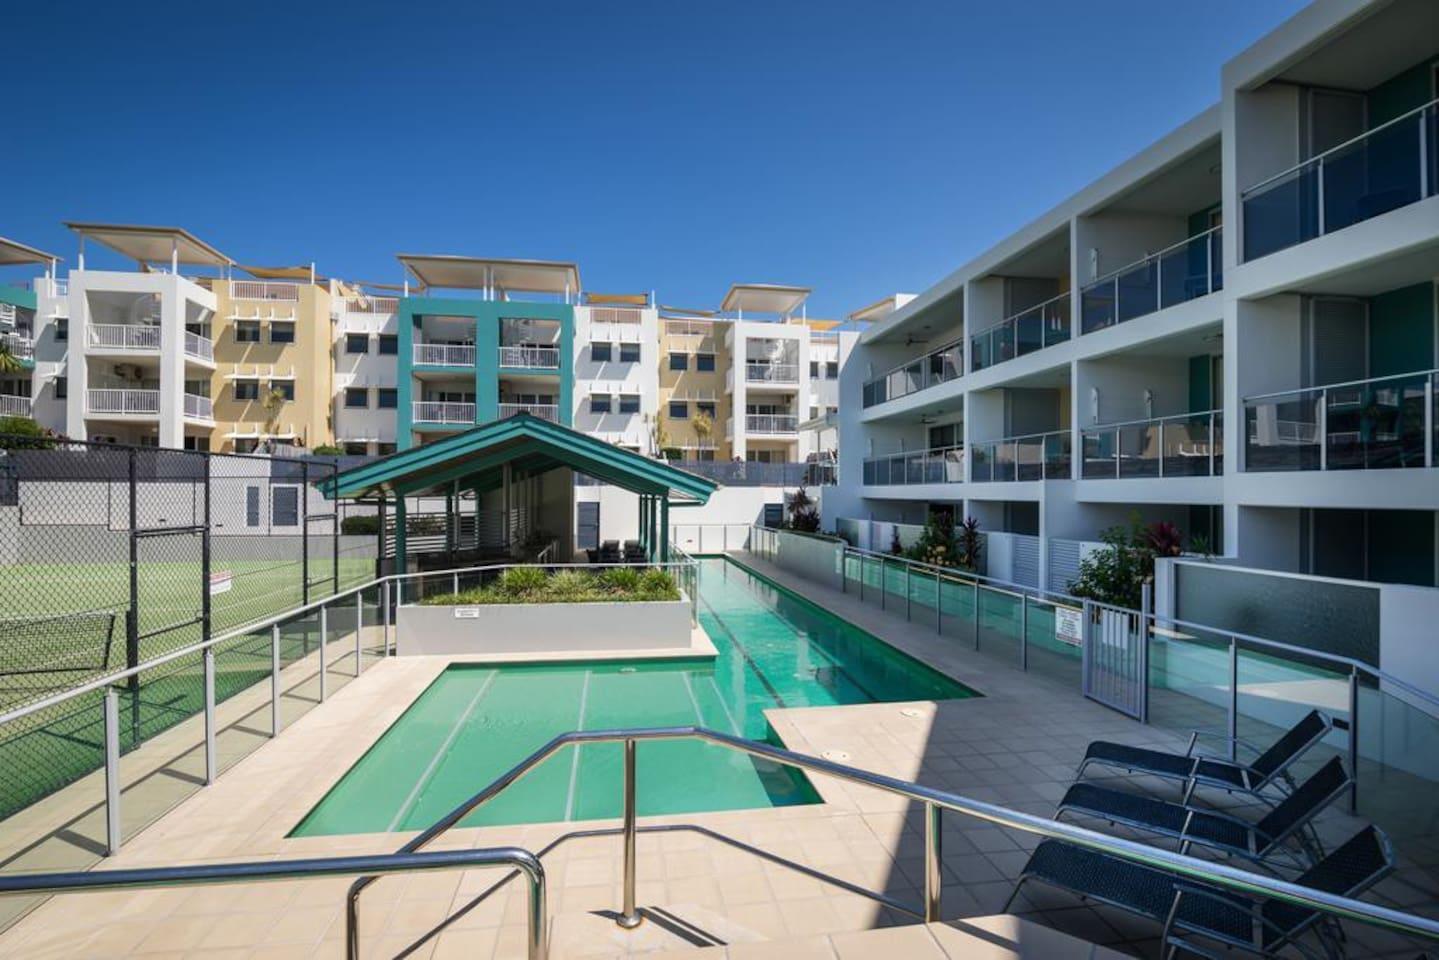 Apartment 2BR Coolum Beach    Rooftop Terrace   Spa   Tennis   Pool photo 26289861